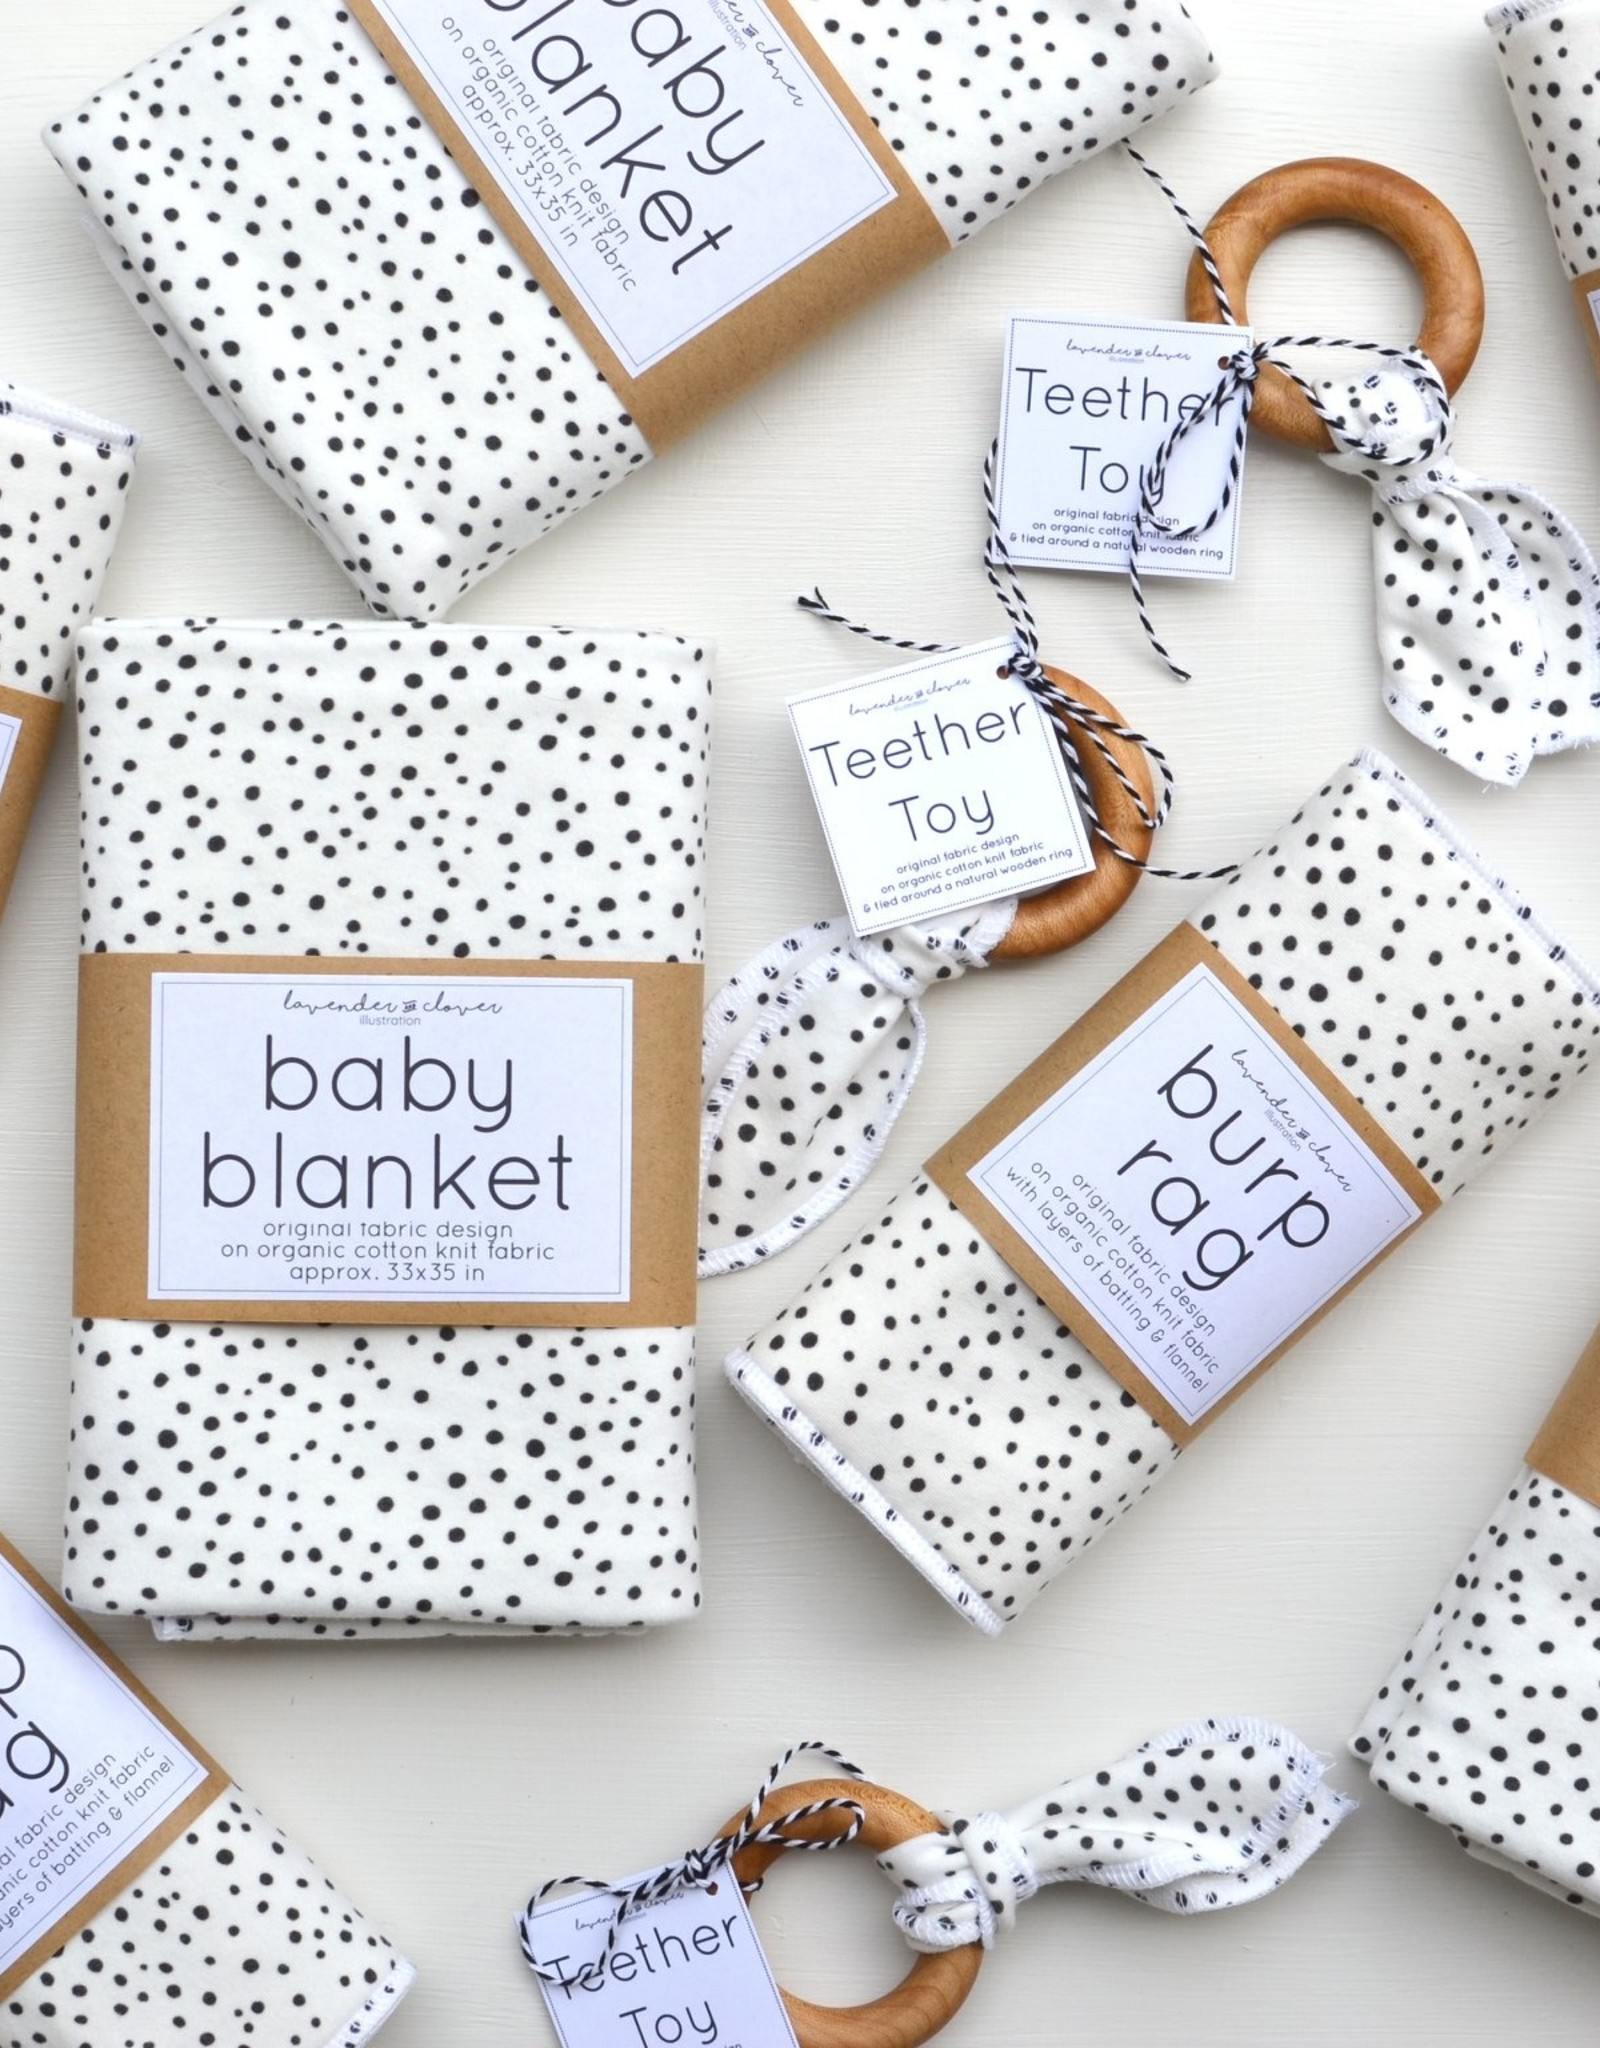 lavender + clover Baby Blankets by Lavender + Clover